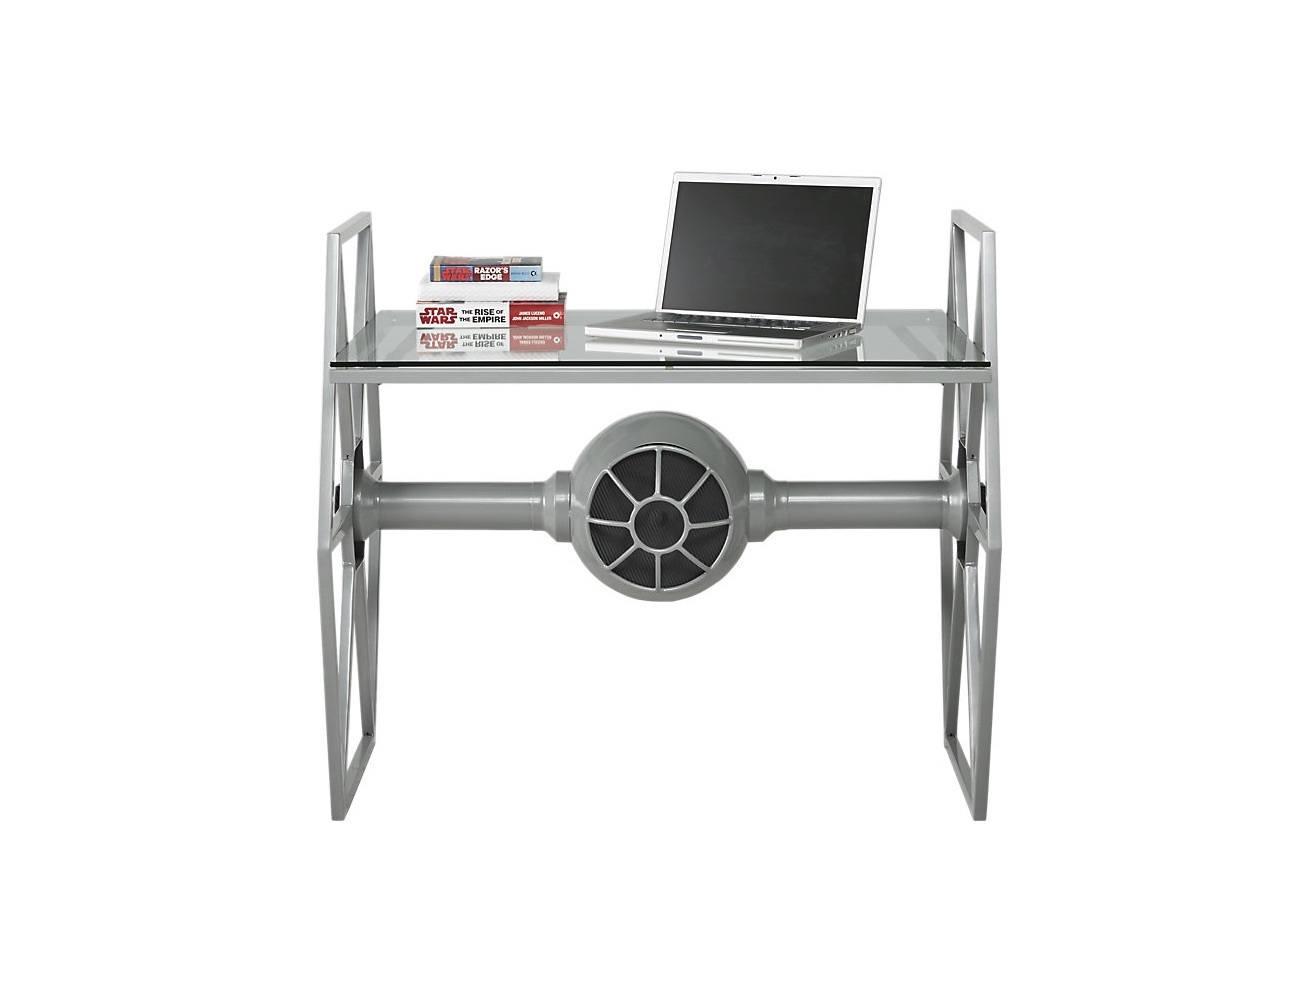 sleek office desk storage design x interface amazon stylish amazing metal ideas finish open gray for